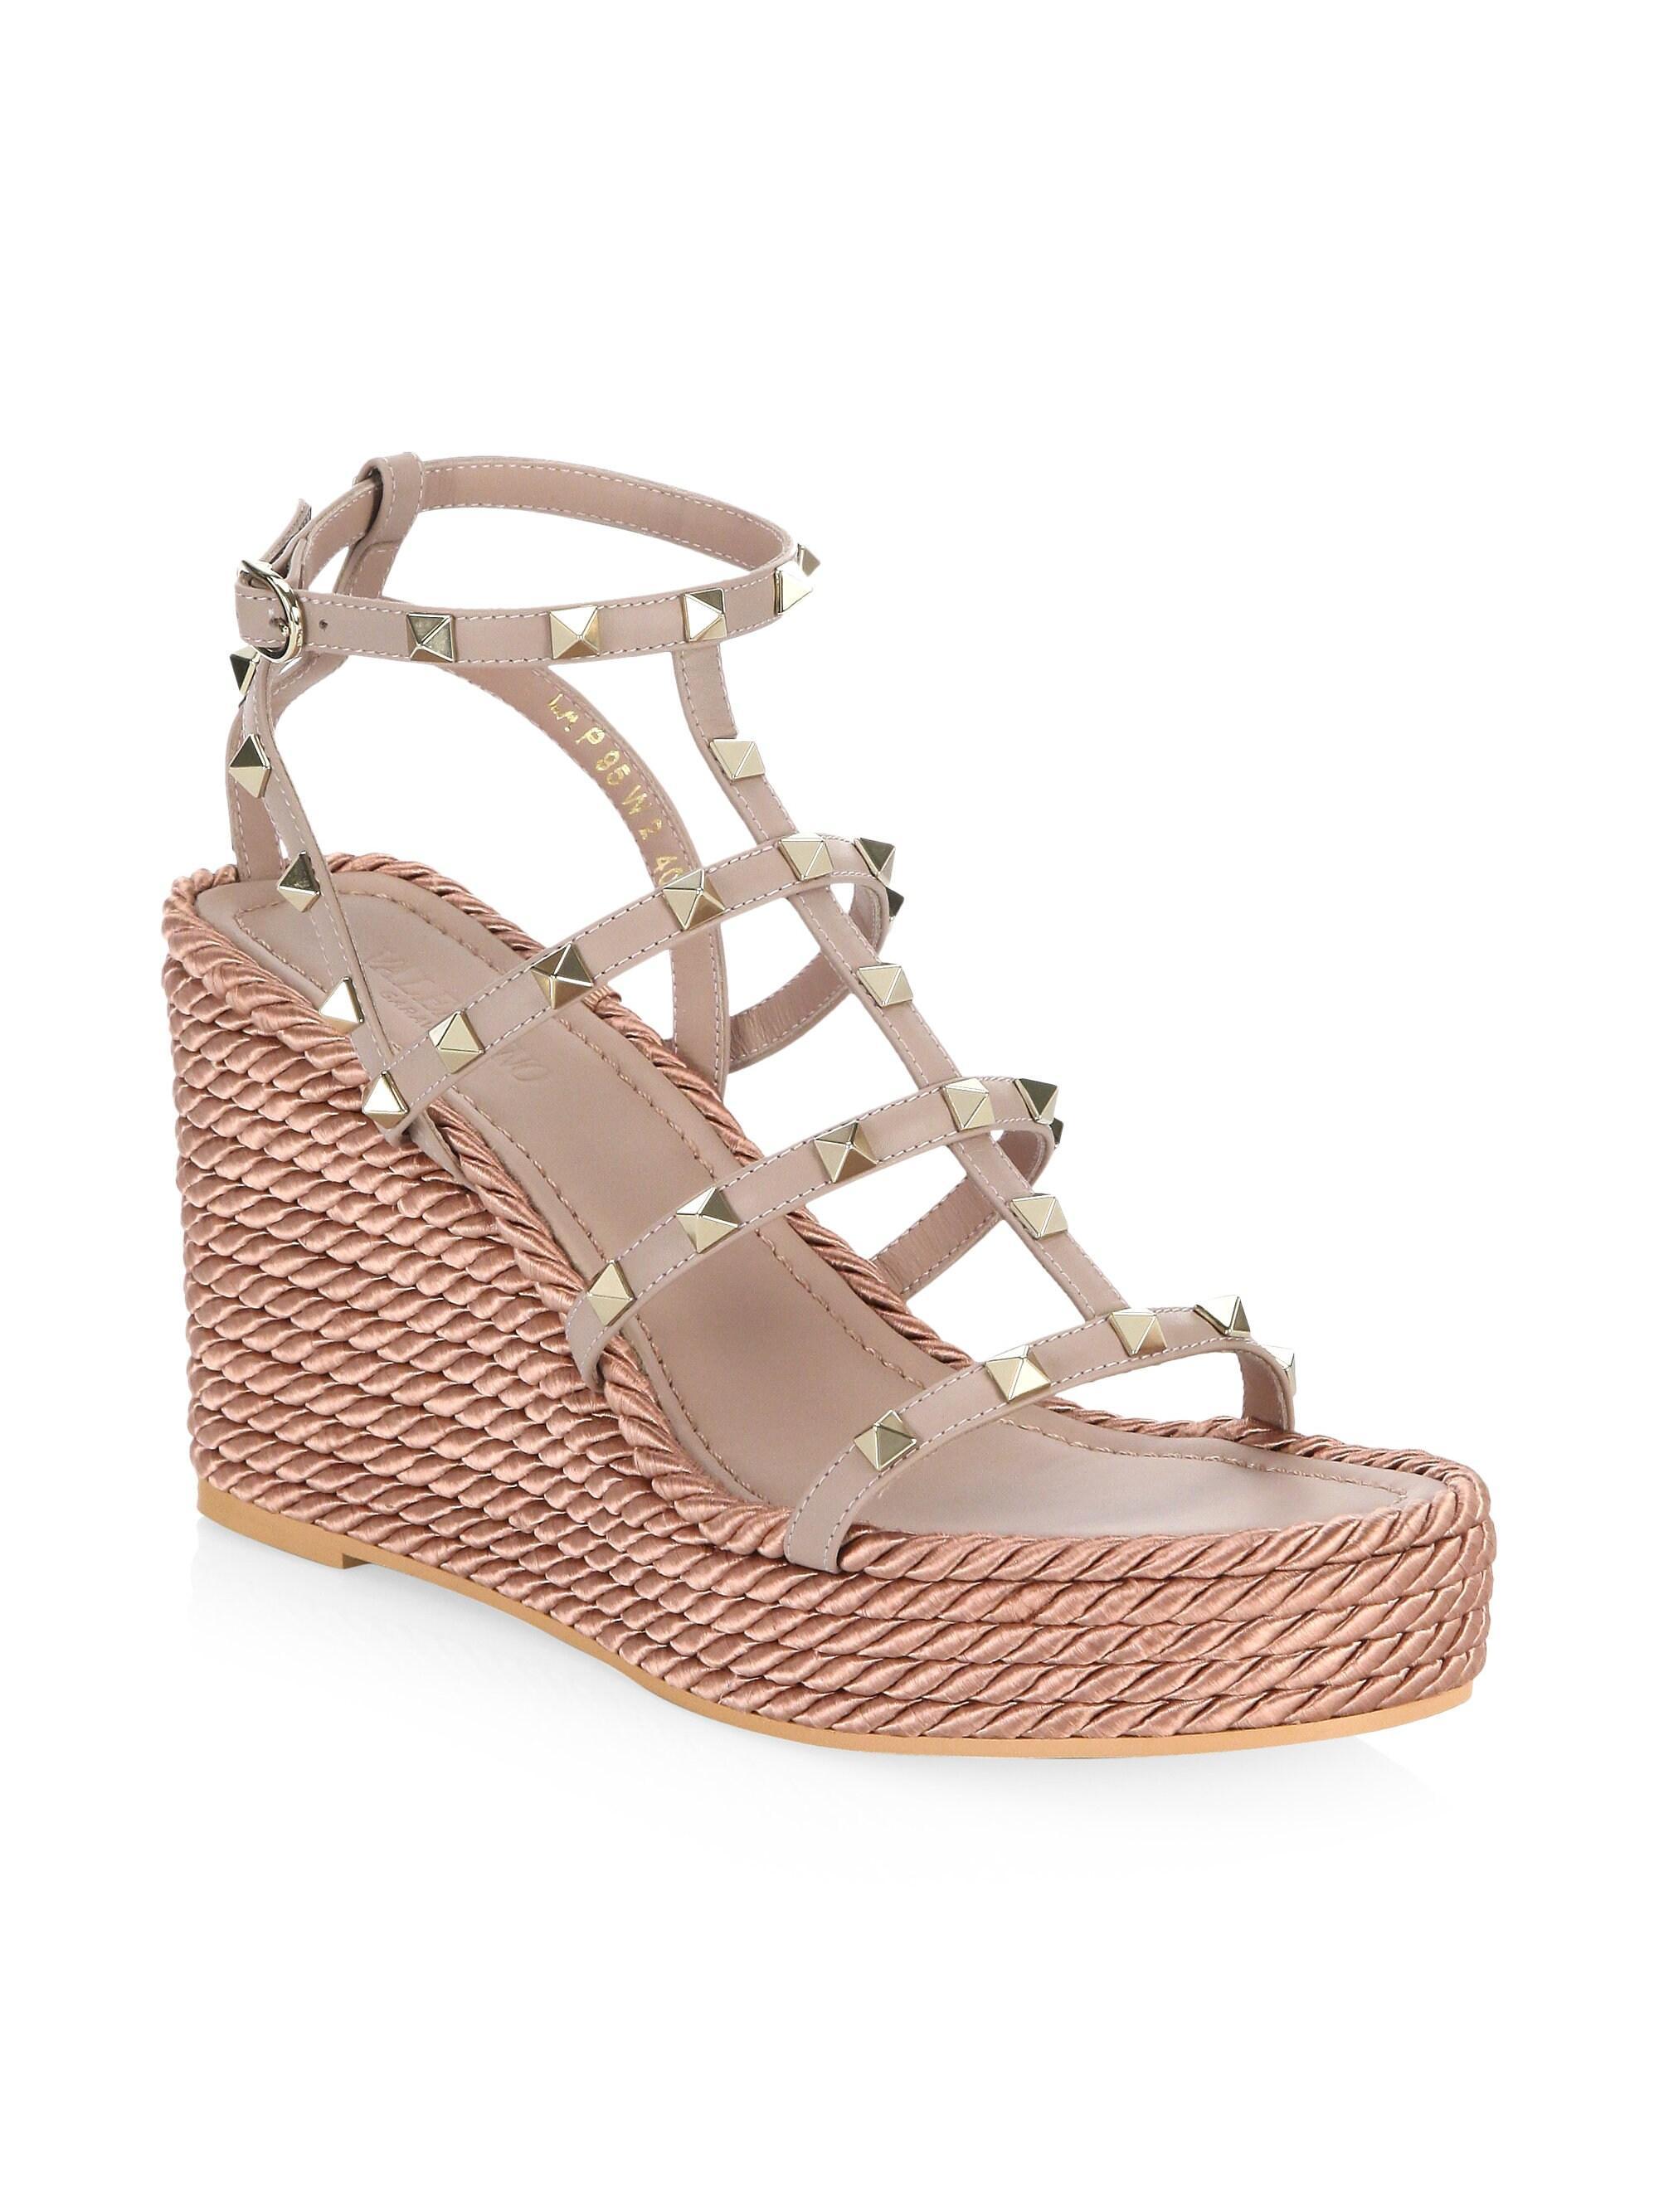 515d71c87a0 Women's Rockstud Leather Espadrille Wedge Sandals